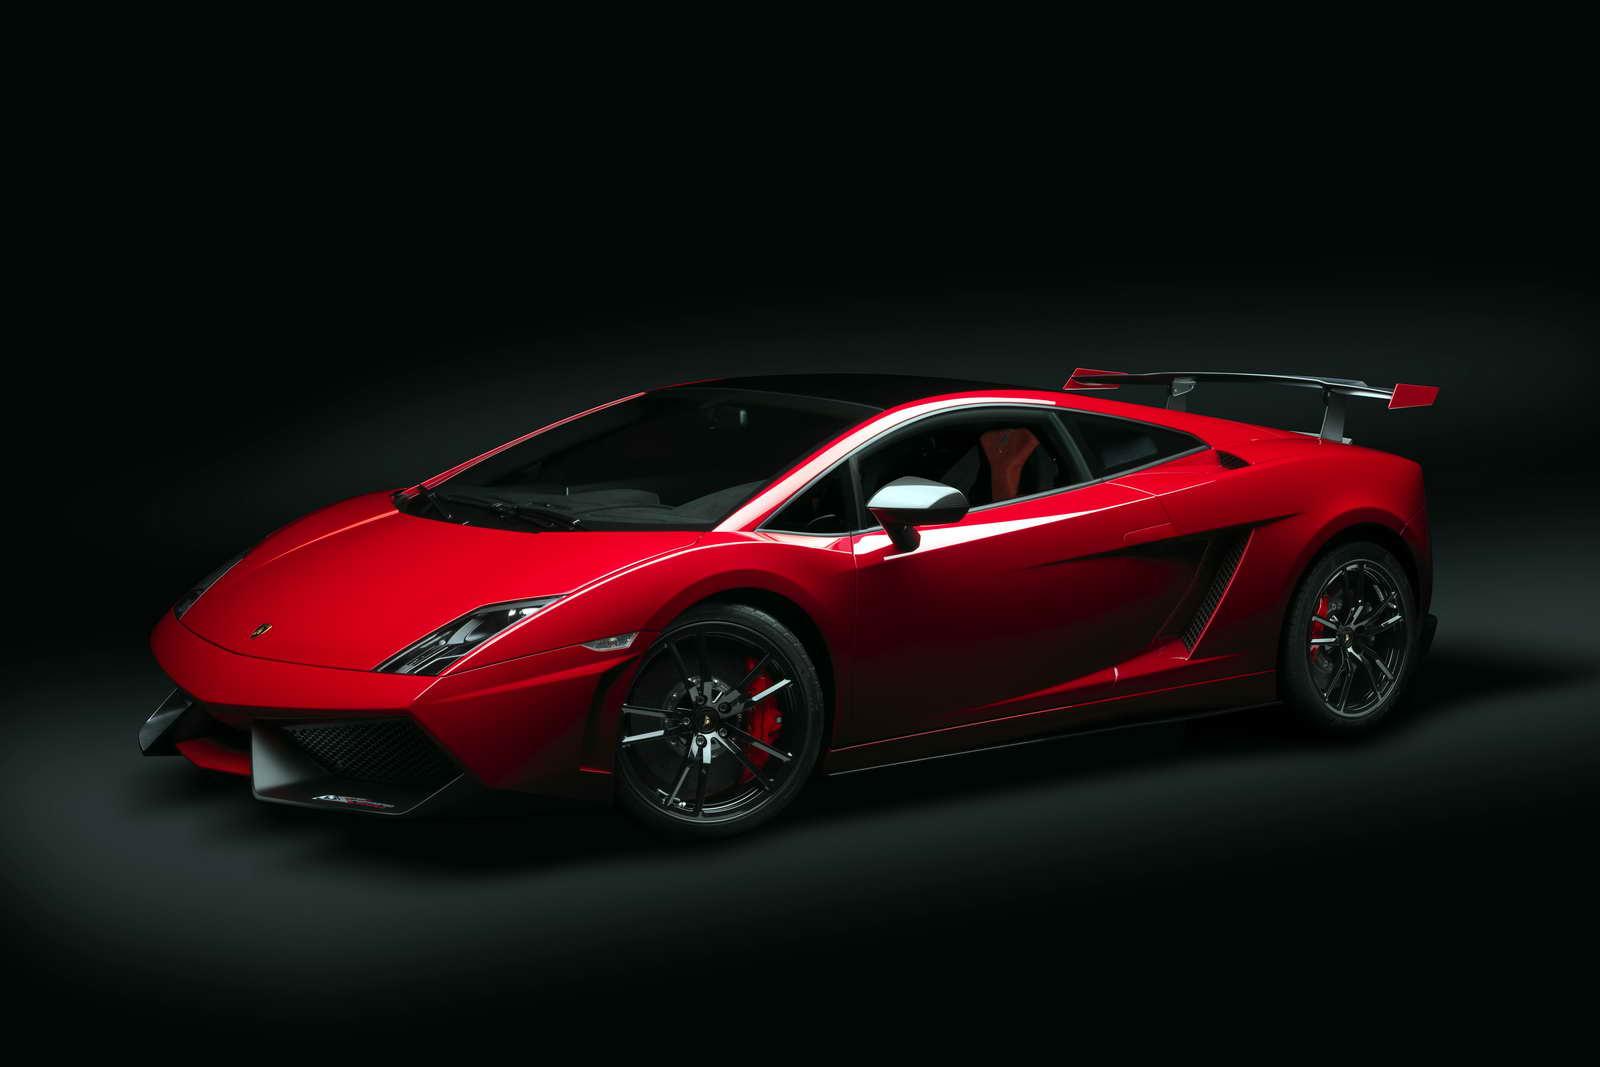 Lamborghini_Gallardo_LP_570_4_Super_Trofeo_Stradale_01